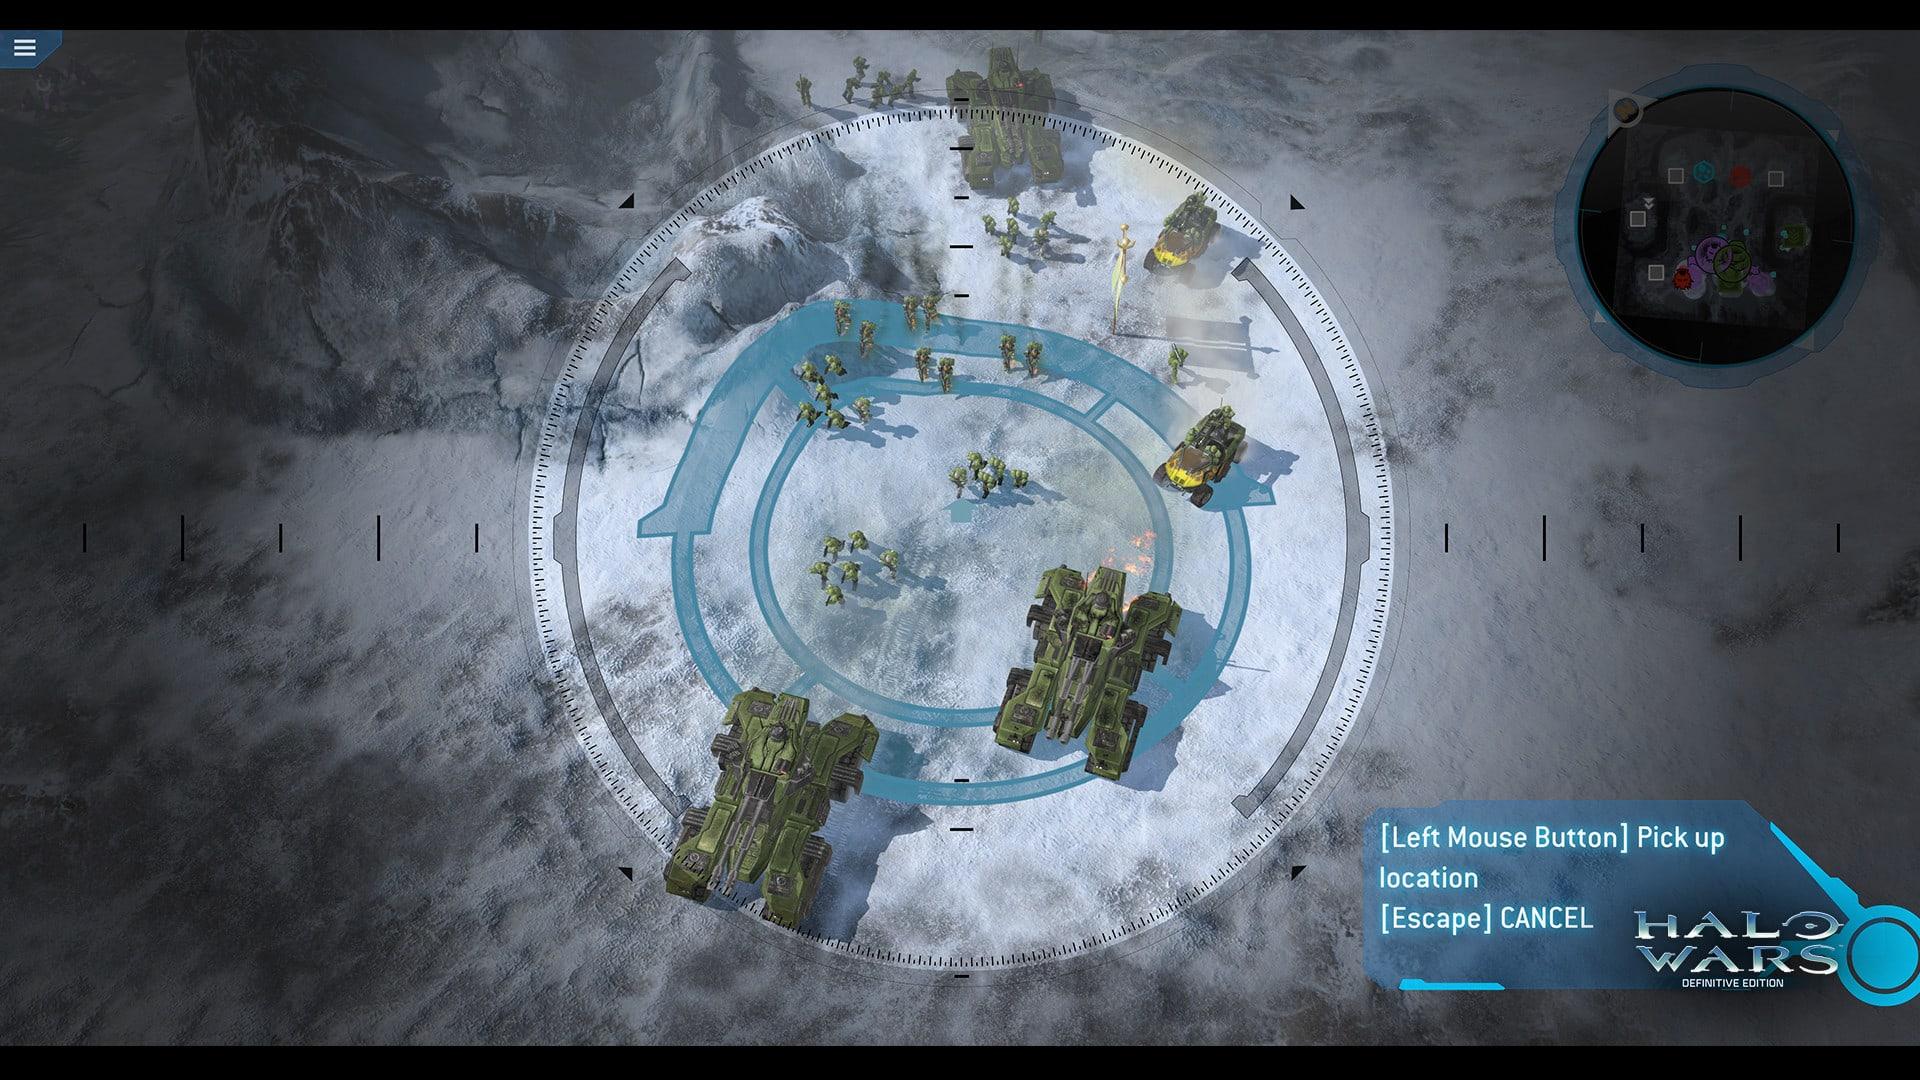 Halo Wars: Definitive Edition